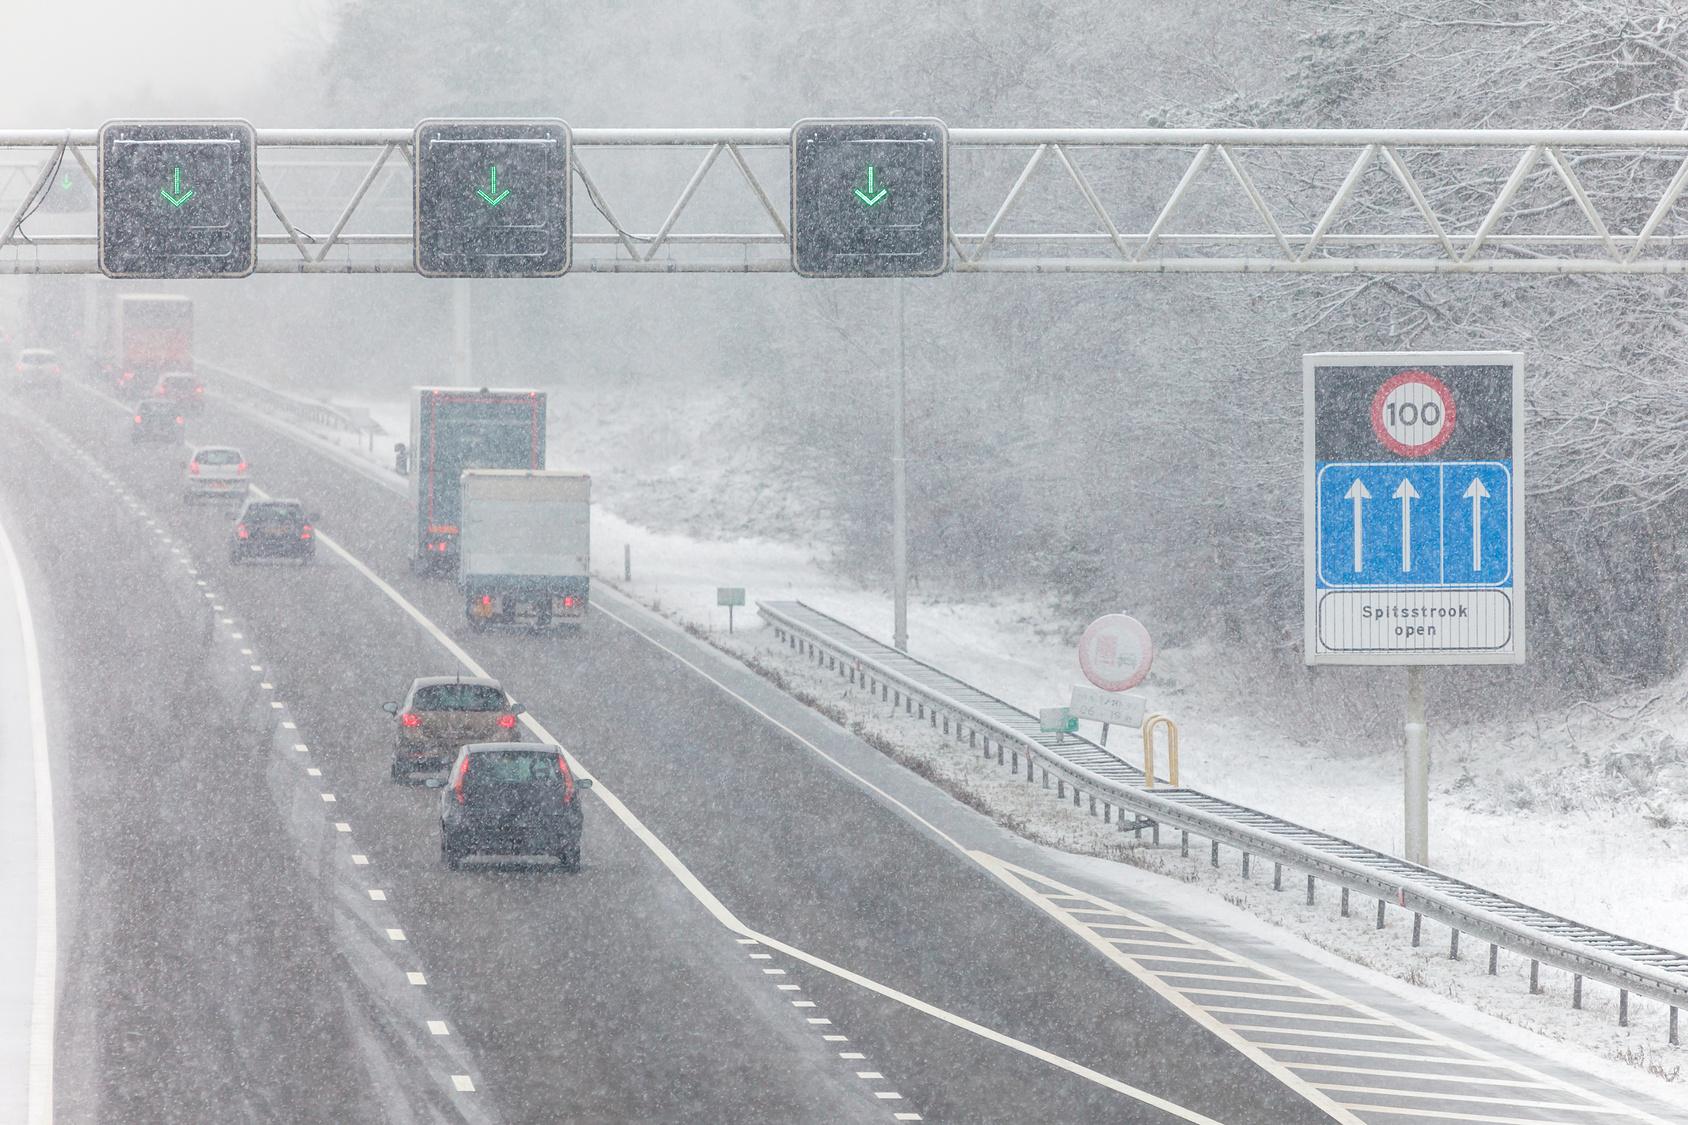 dutch highway during winter snow geblitzt fahrverbot bu geld rechtsanwalt berlin. Black Bedroom Furniture Sets. Home Design Ideas